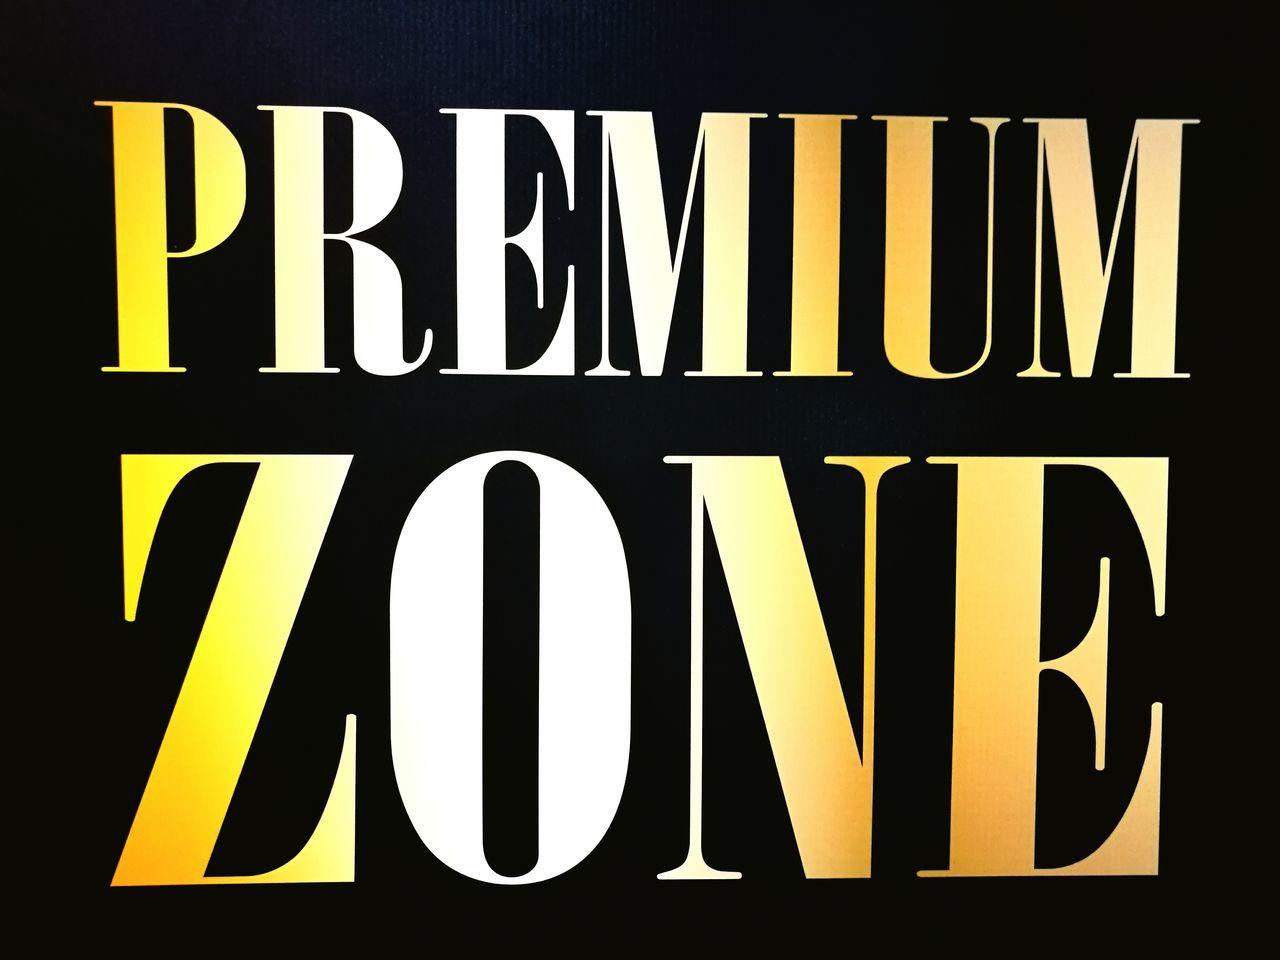 Premiun Zone Addpost Mobilephotography